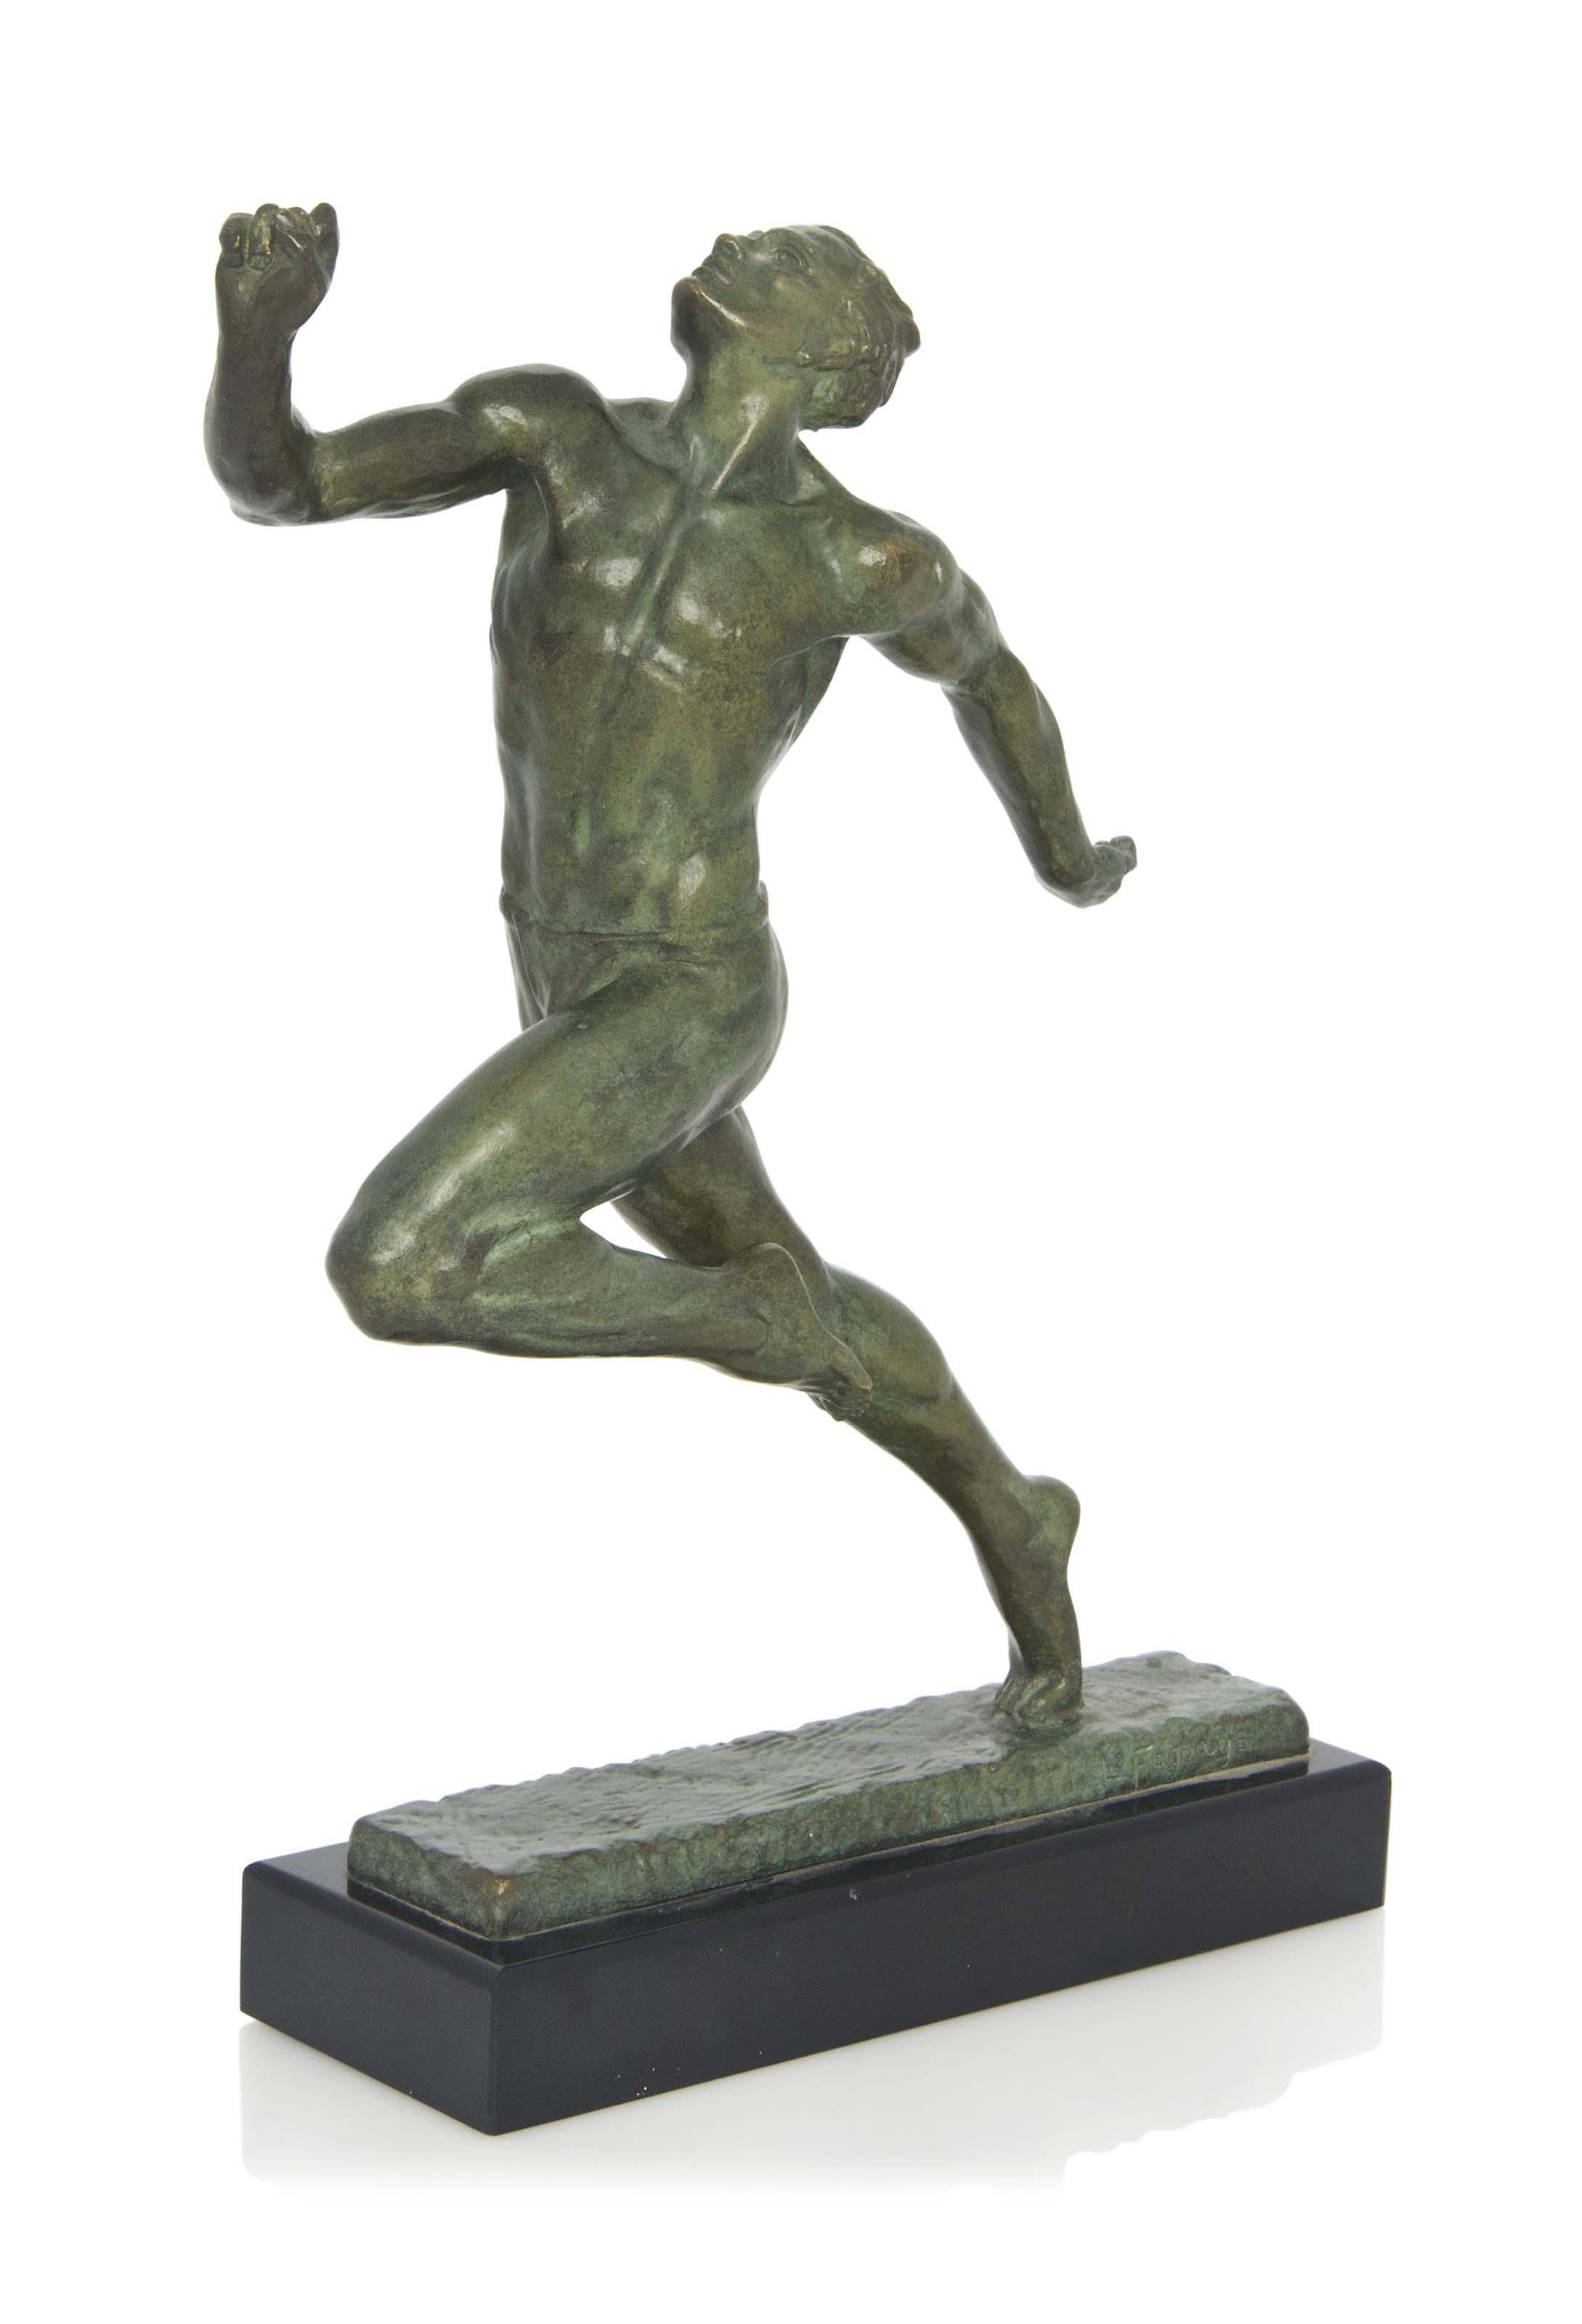 'THE SPRINTER ' A PIERRE LE FAGUAYS (1882-1935) COLD-PAINTED BRONZE FIGURE